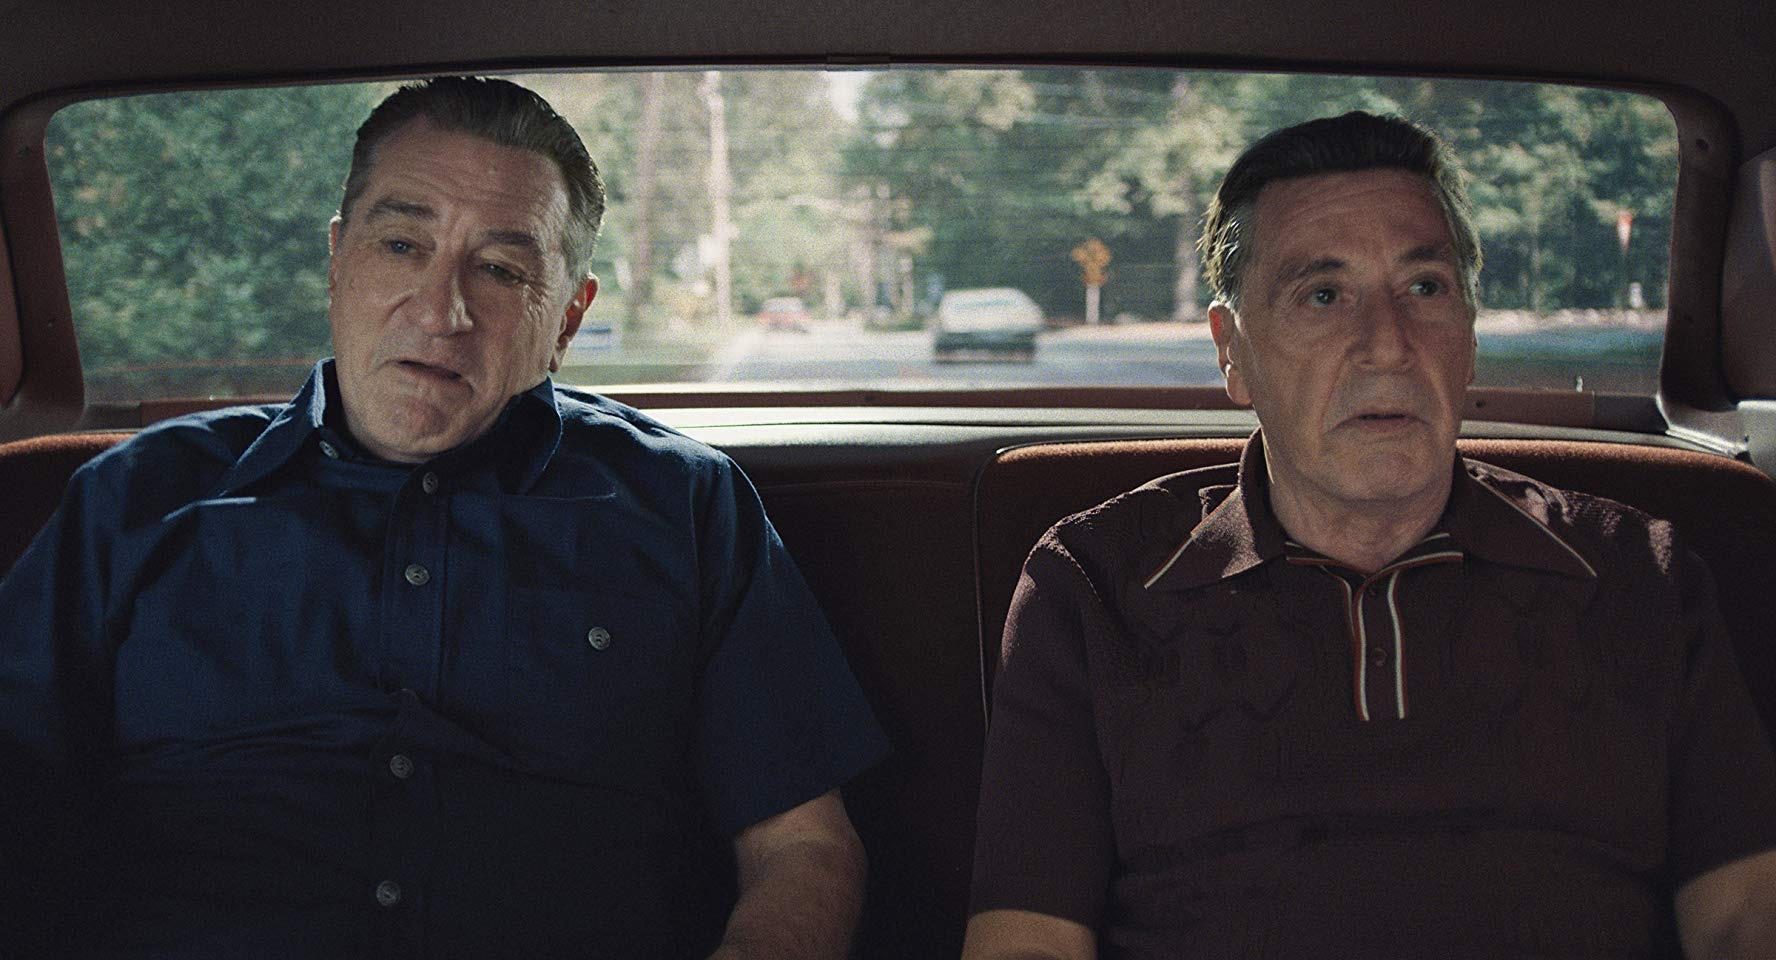 Robert De Niro and Al Pacino in The Irishman (2019)